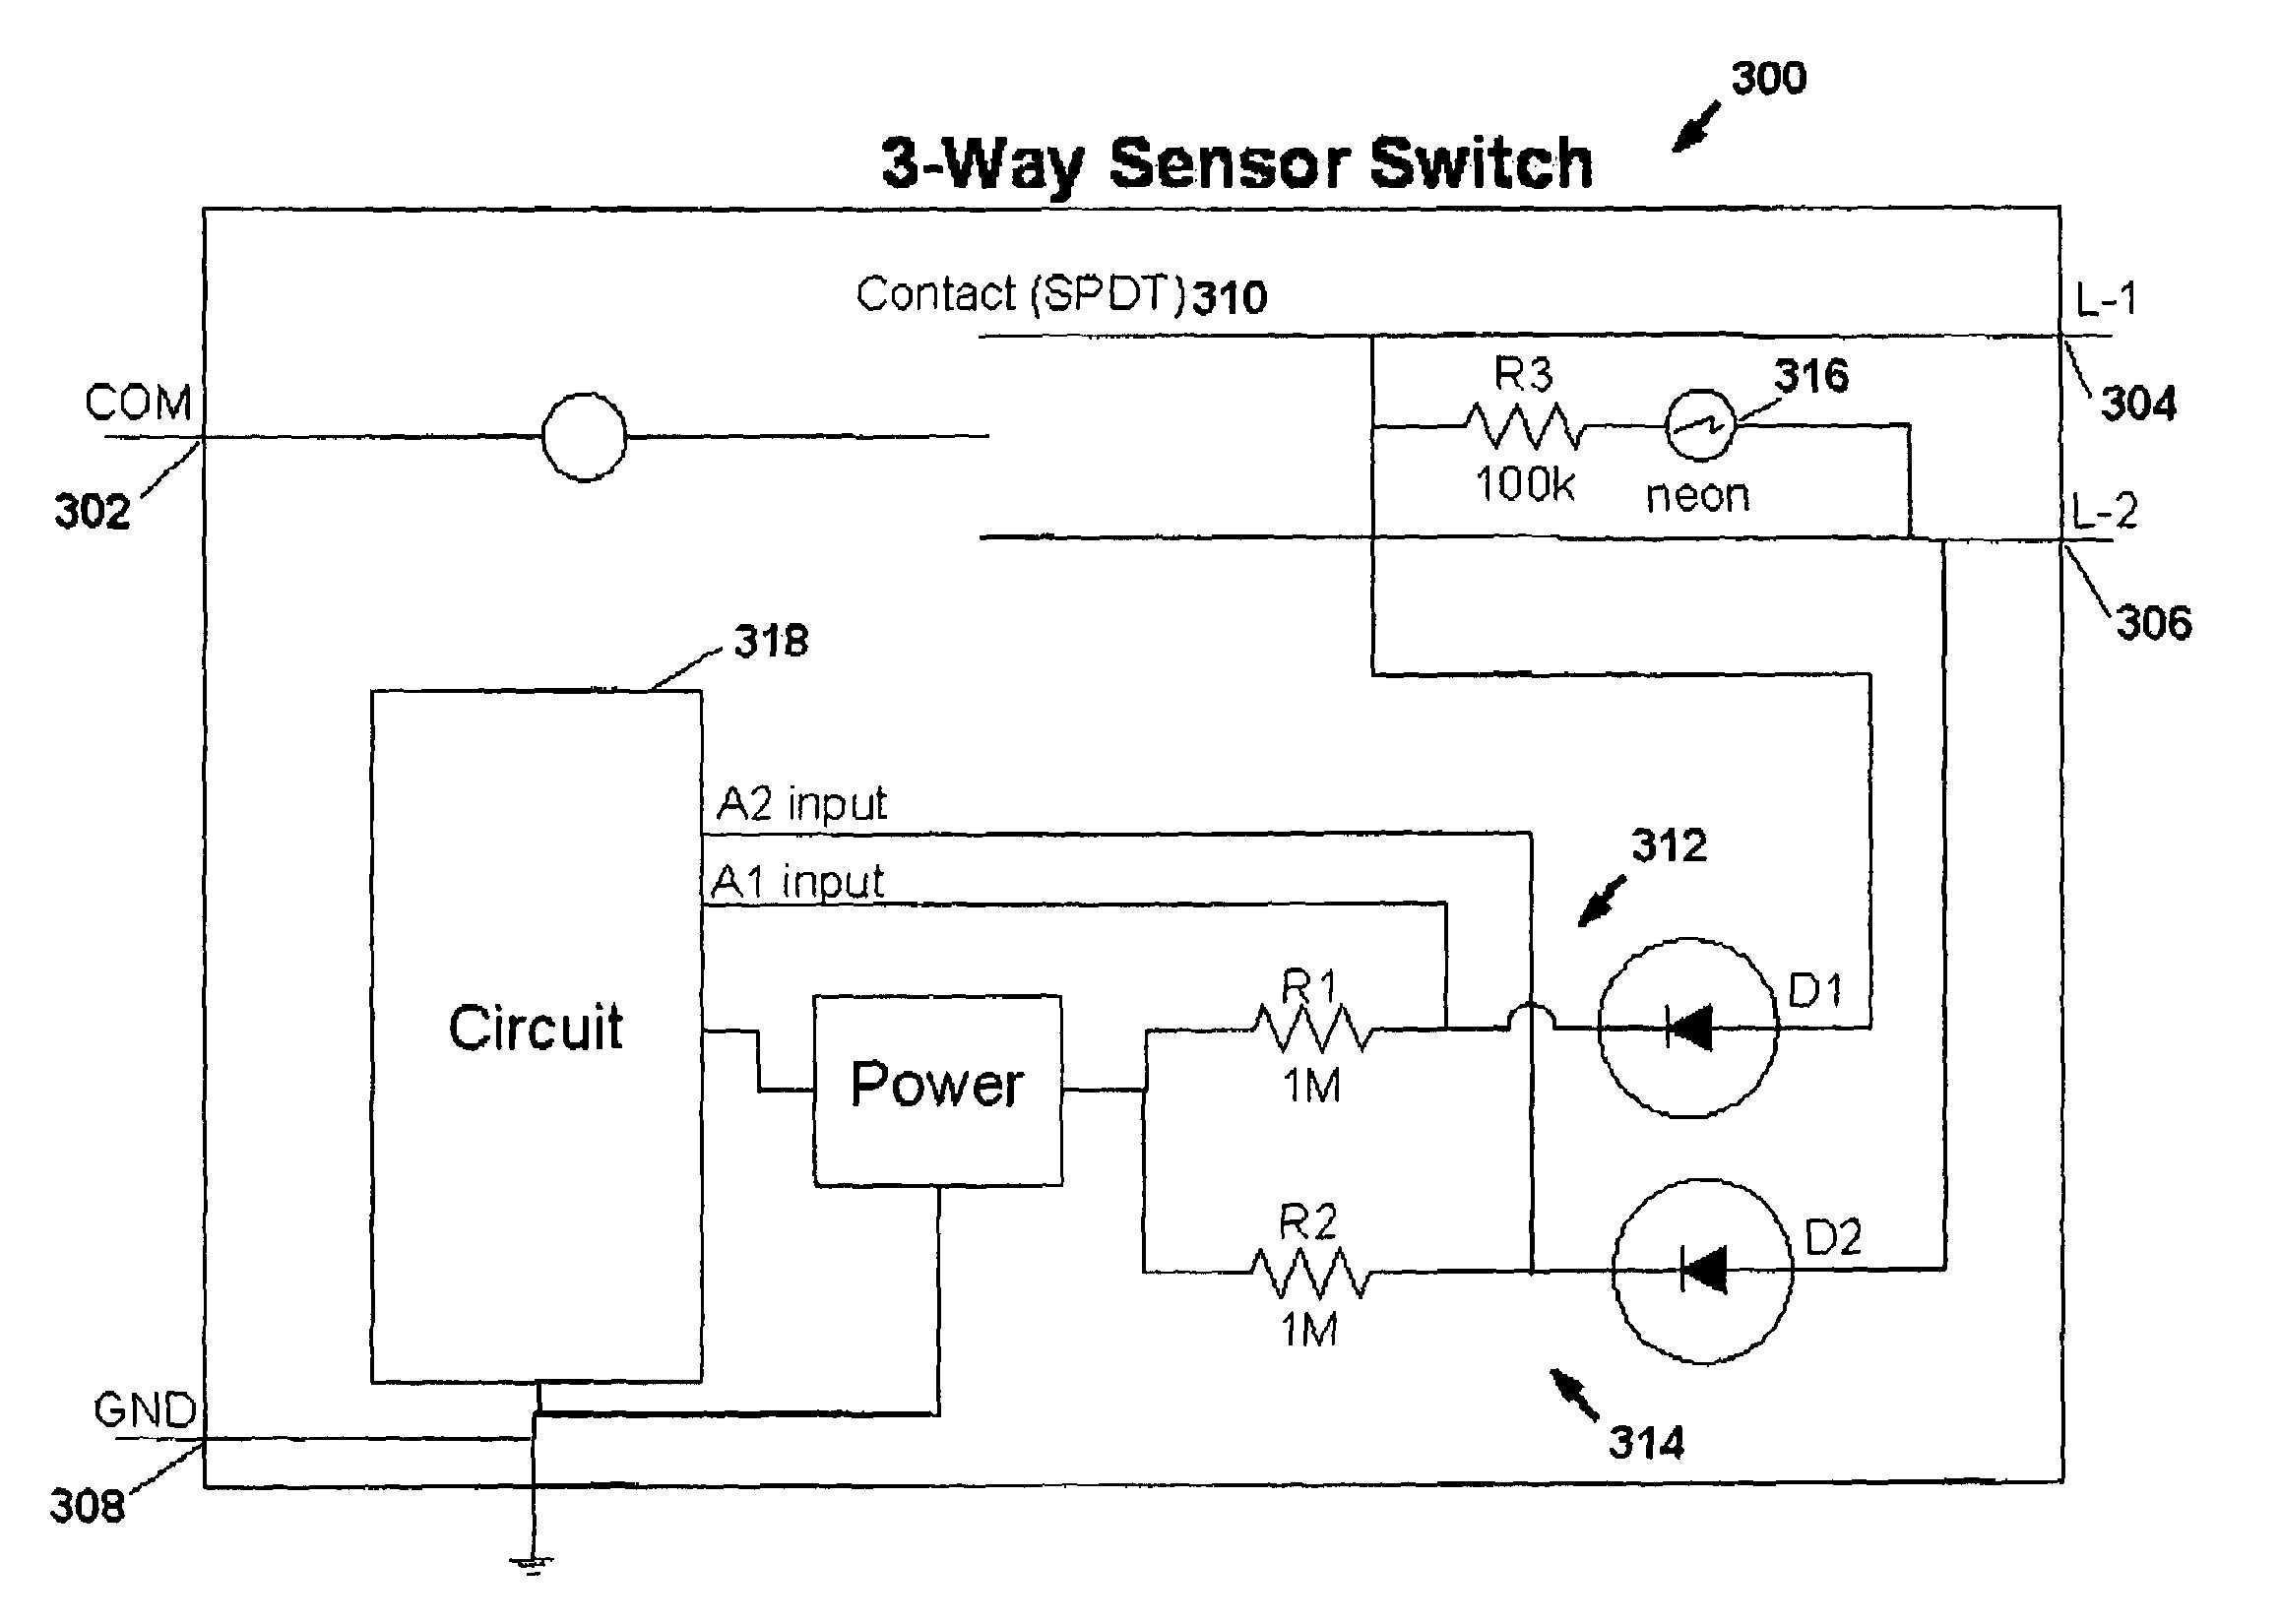 3 way motion sensor switch wiring diagram Collection-New Leviton Motion Sensor Wiring Diagram 4-k